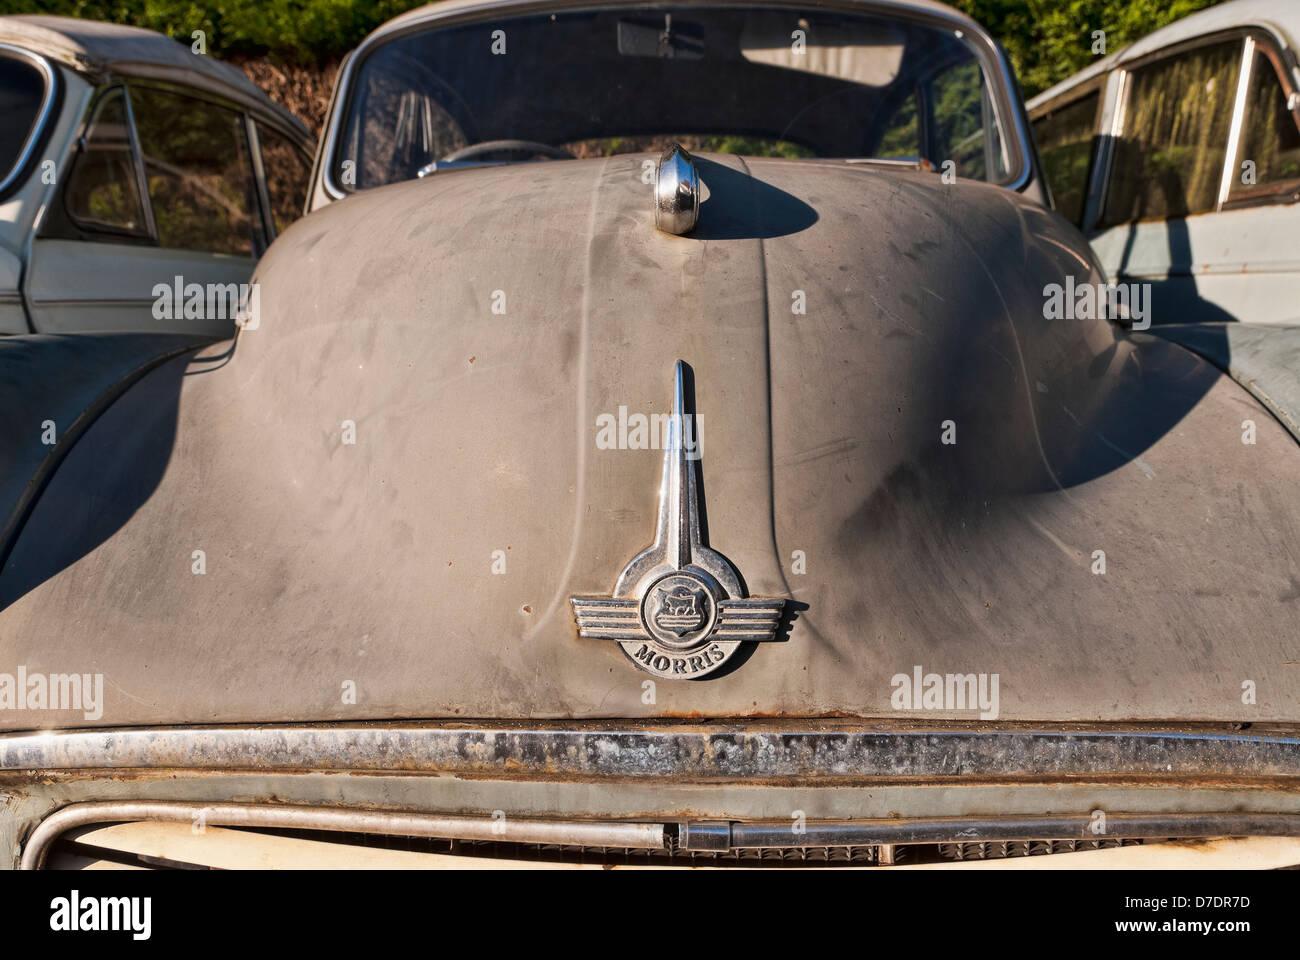 Old Morris Minor Cars for Restoration Stock Photo: 56237313 - Alamy